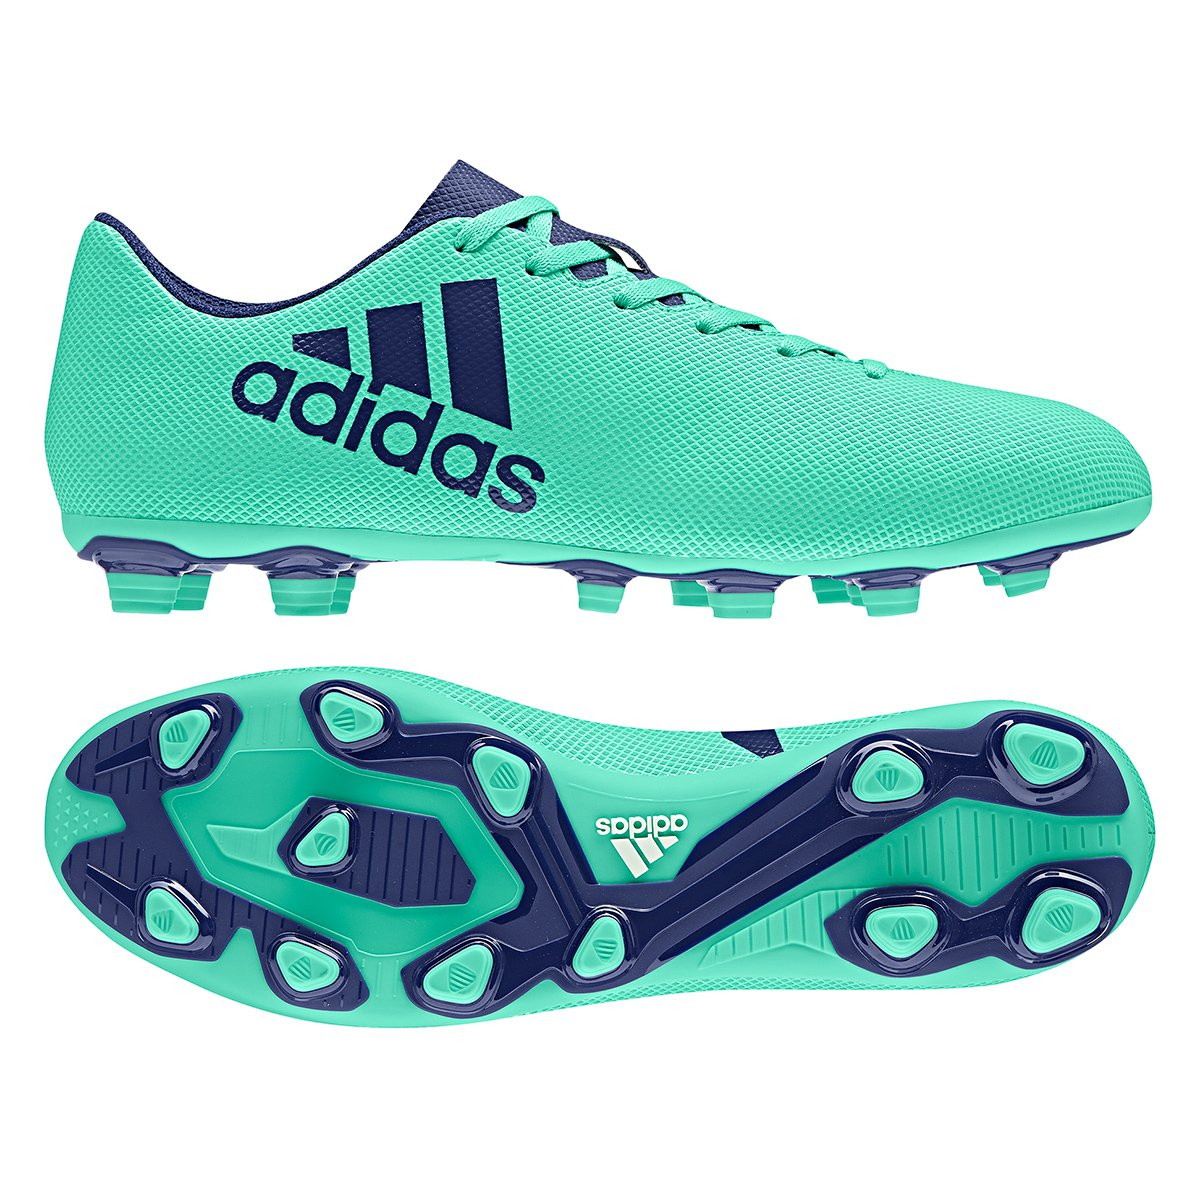 Chuteira Campo Adidas X 17.4 FXG - Compre Agora  cfebeb9f6a2c5